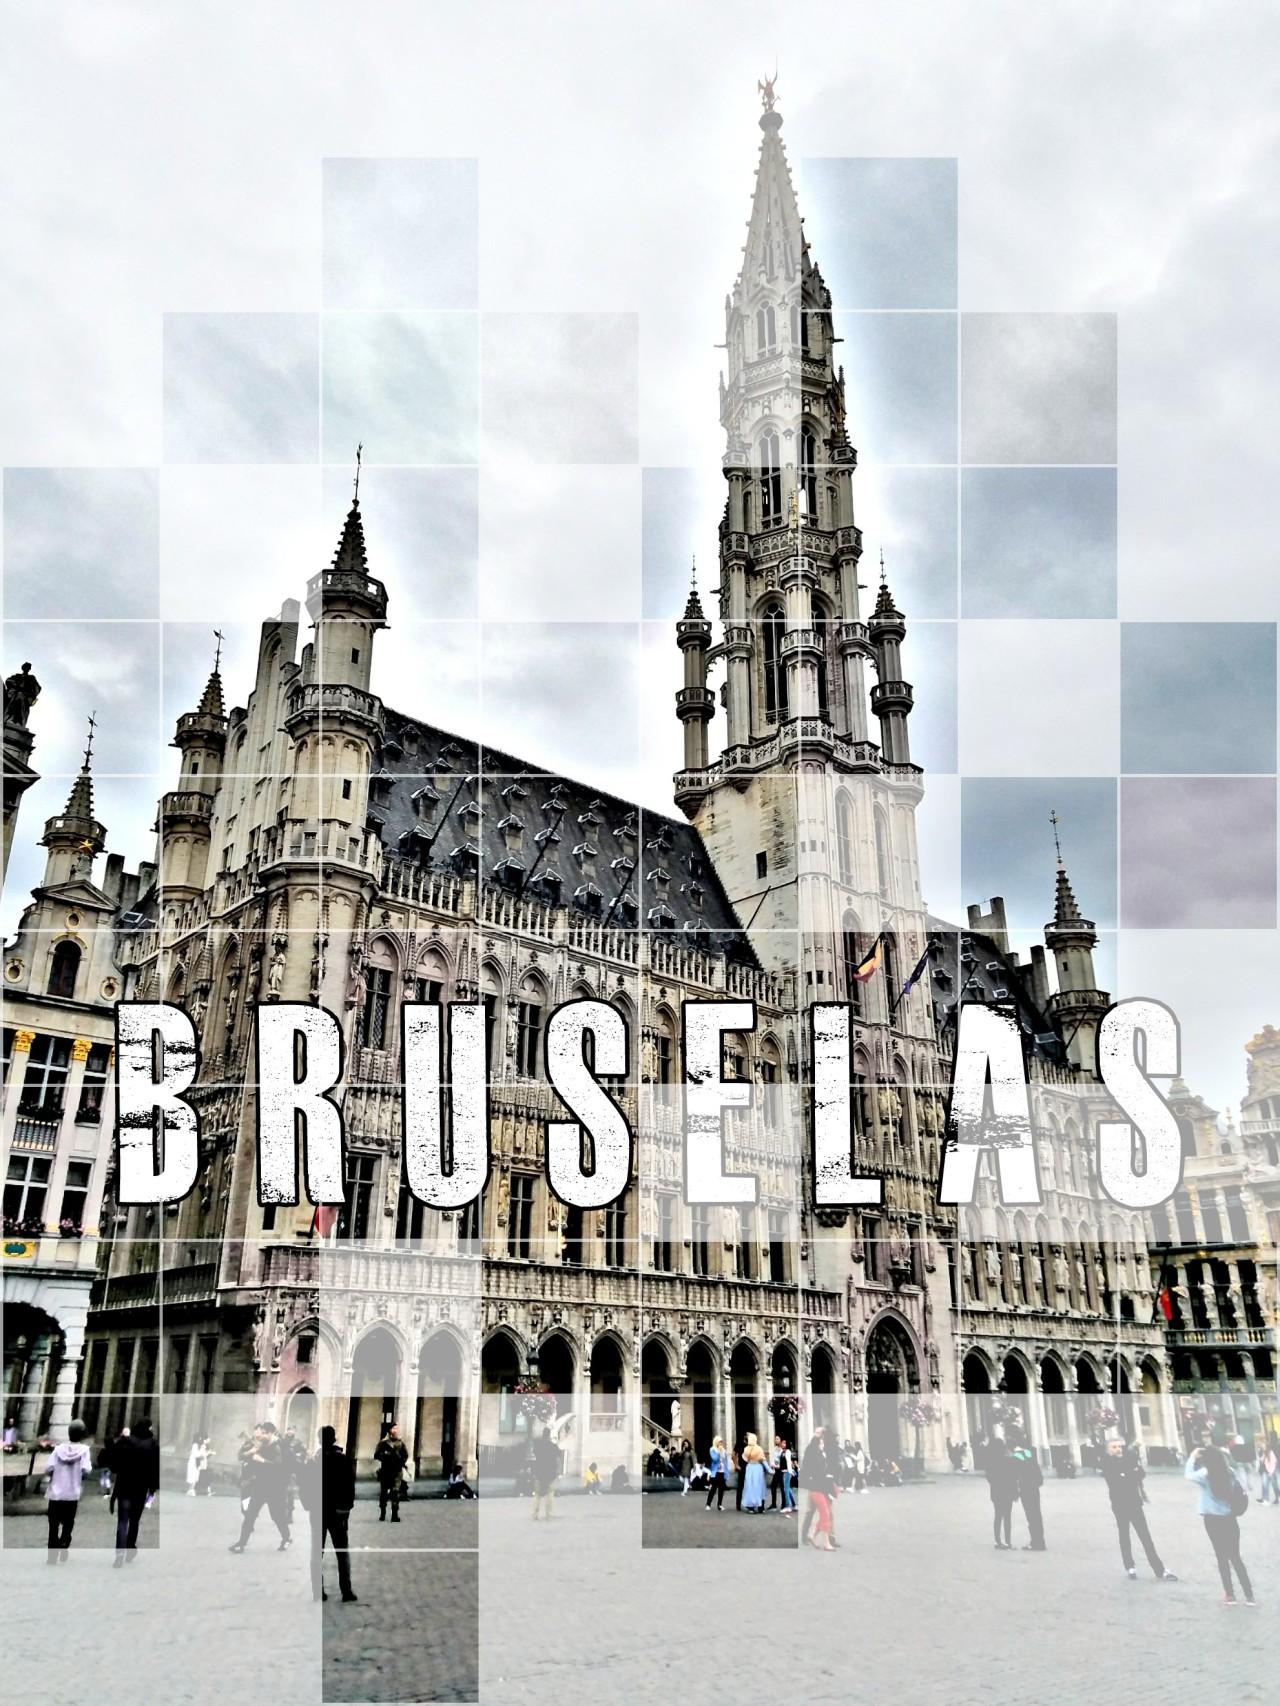 Bruselas, la gran capitaleuropea